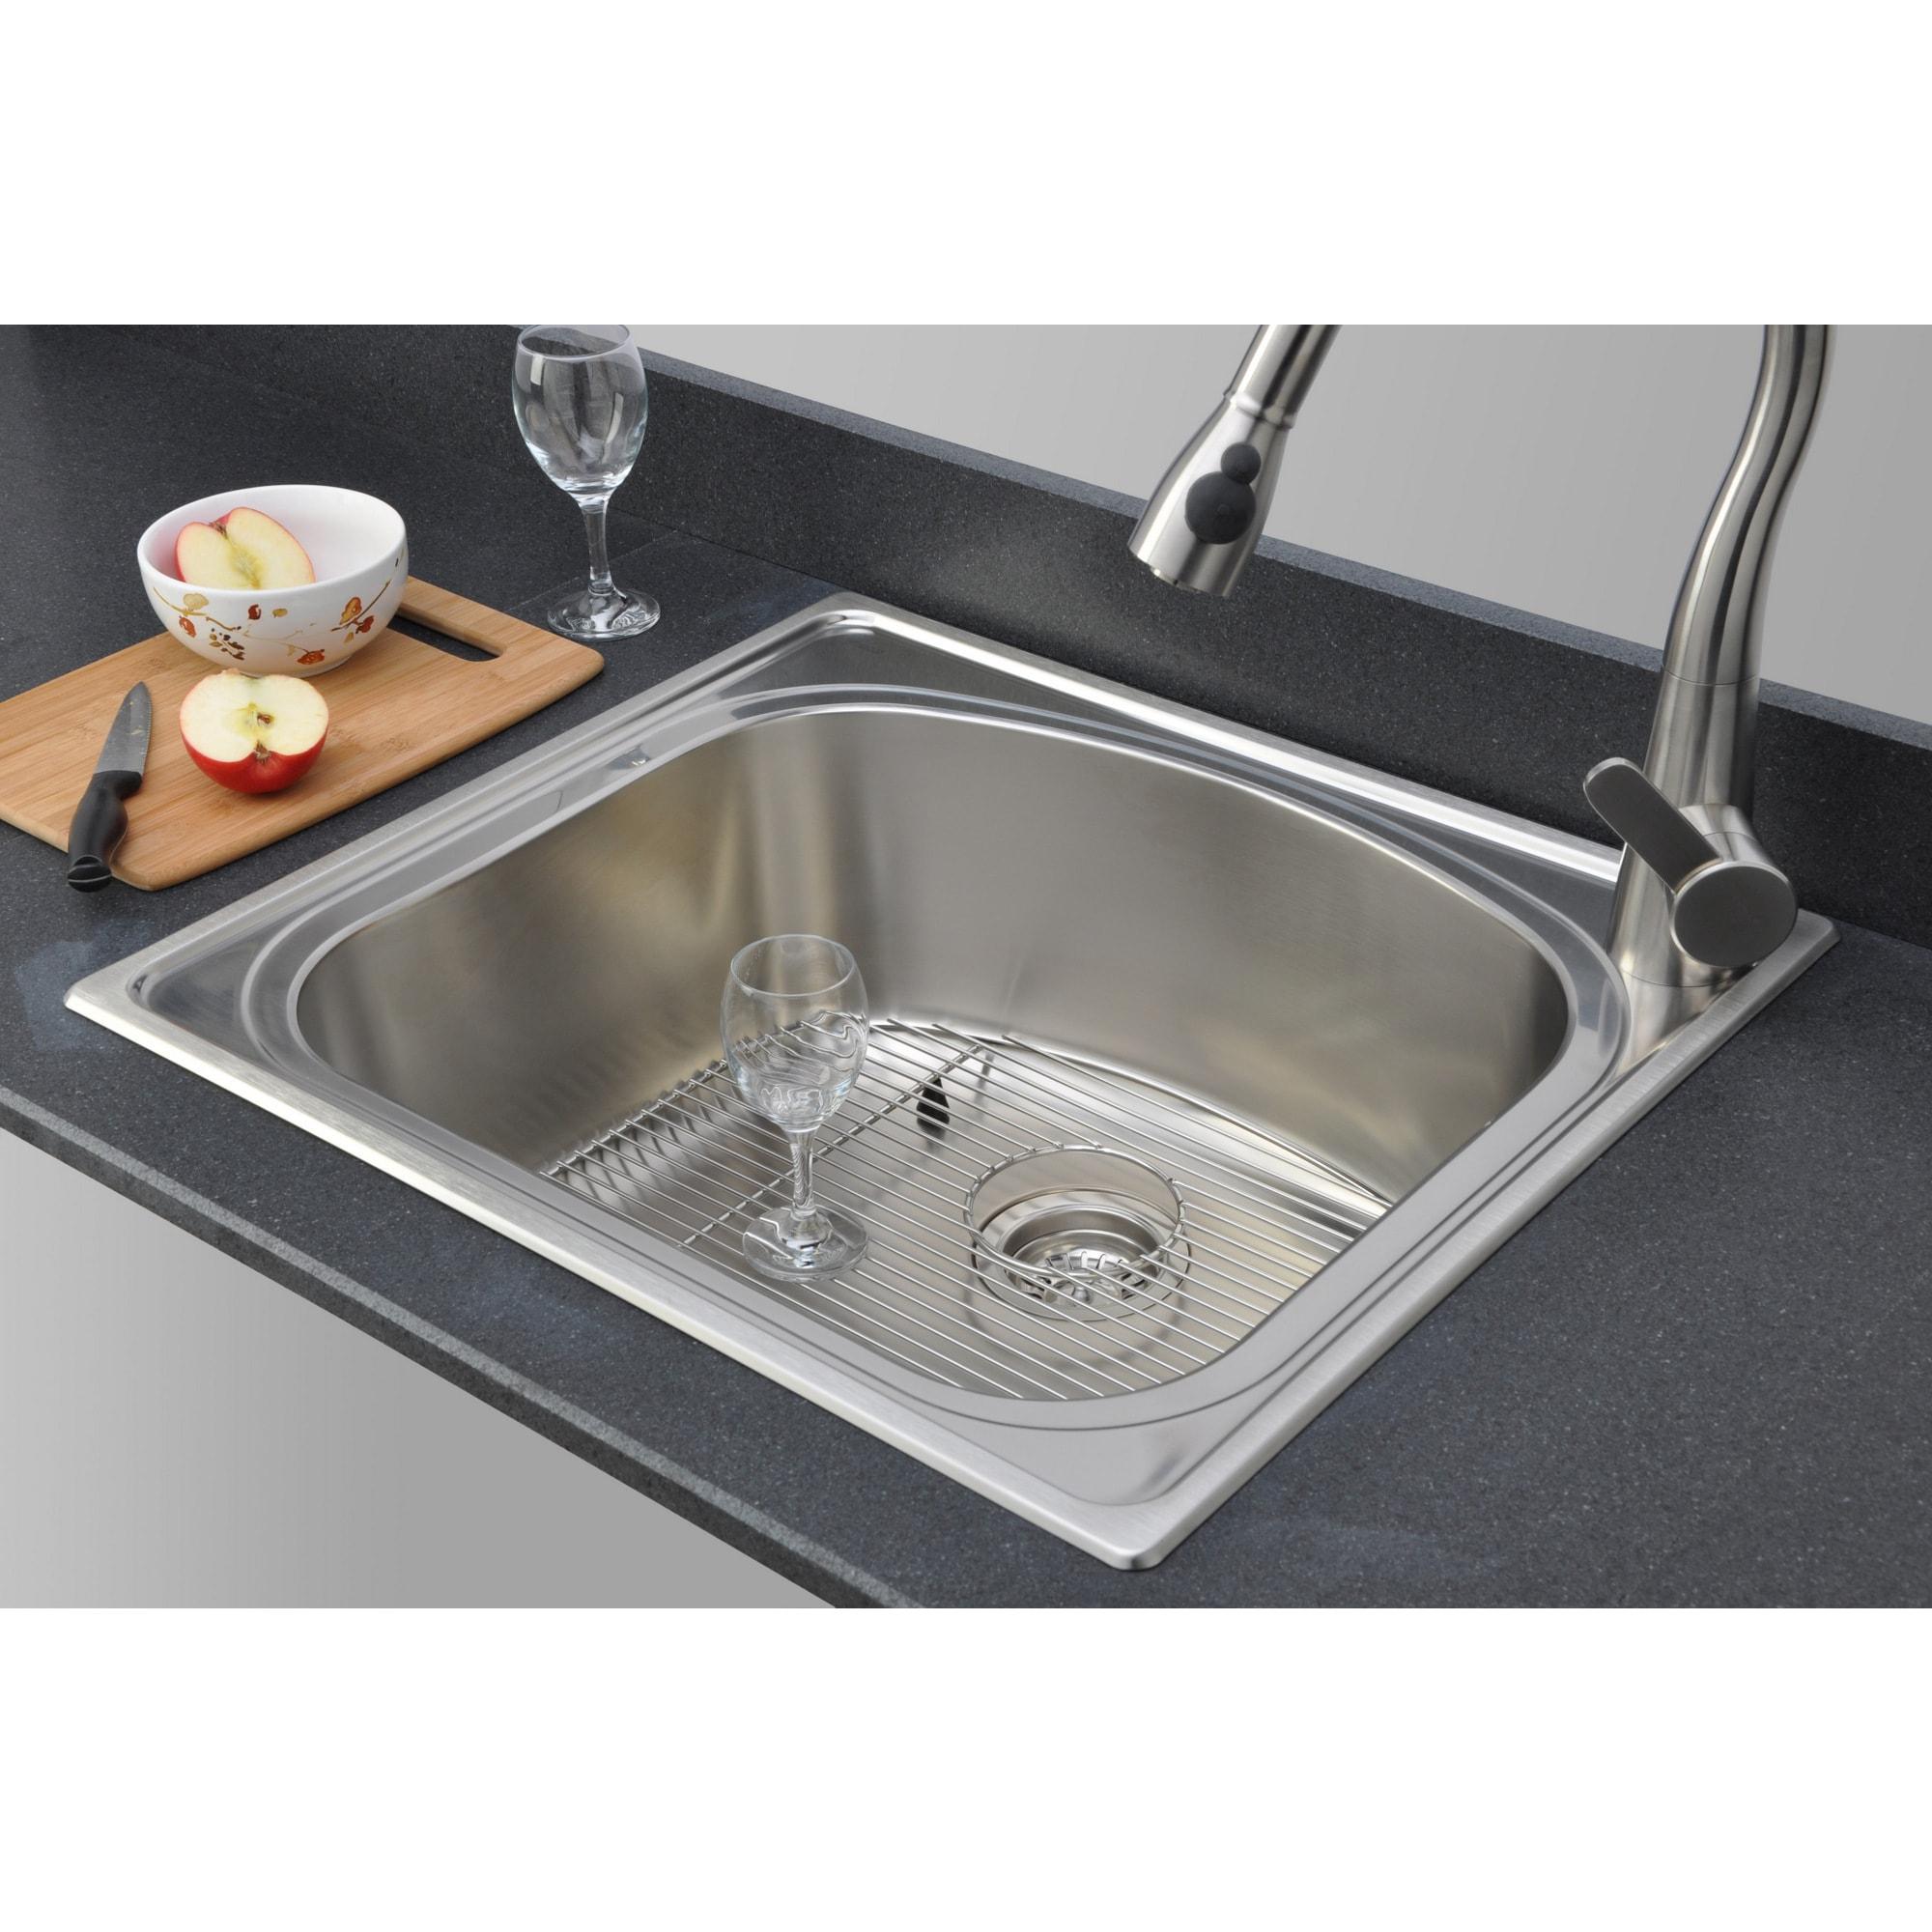 wells sinkware 18 gauge single bowl topmount stainless steel wells sinkware cht2522 8r 18 gauge kitchen single topmount steel      rh   ebay com